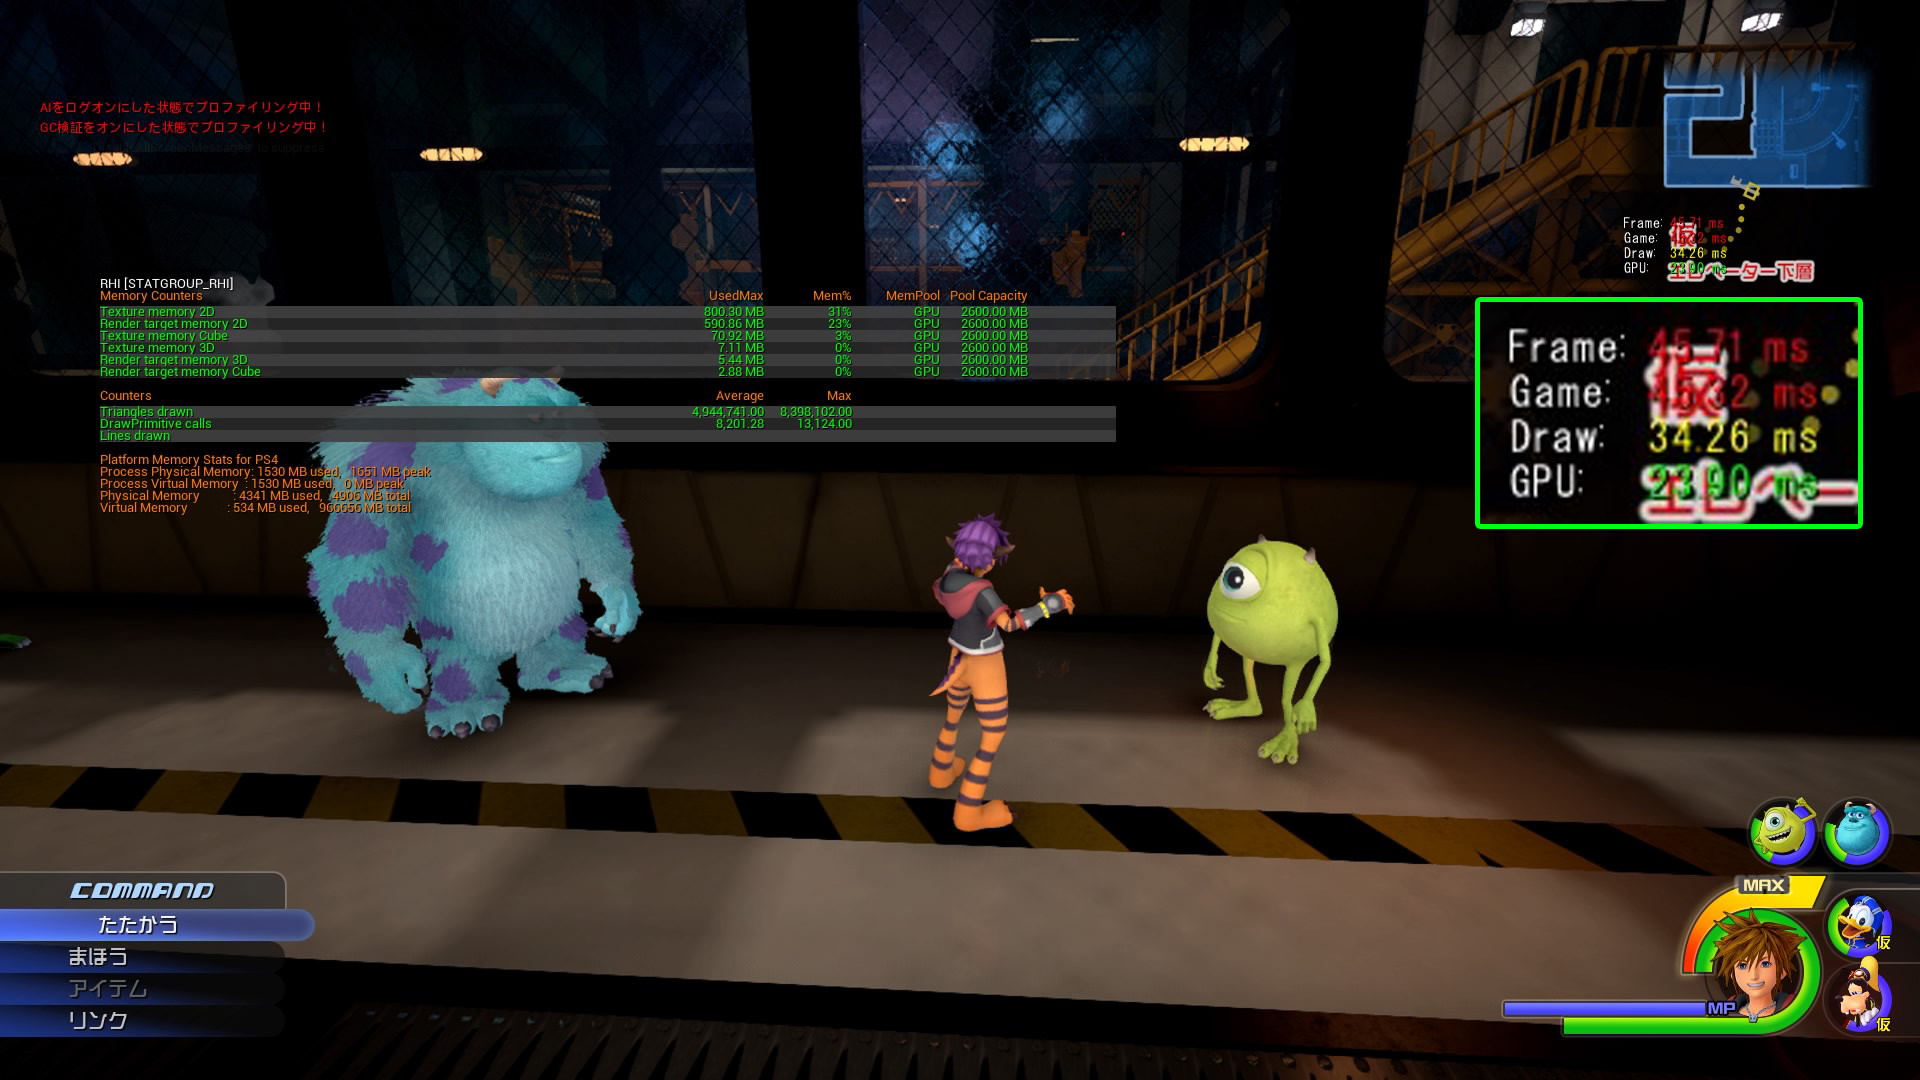 RUMOR More Monsters Inc Screenshots From KINGDOM HEARTS